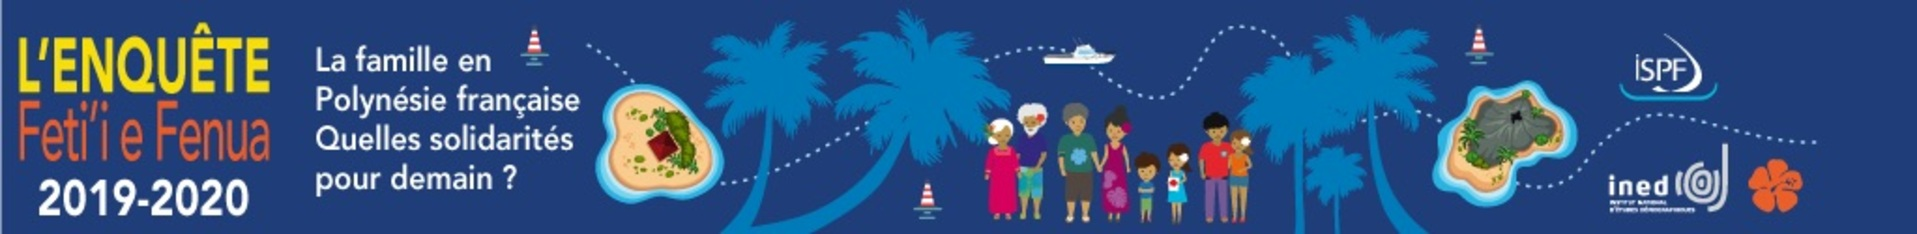 atollseveryday_bandeau1.jpg